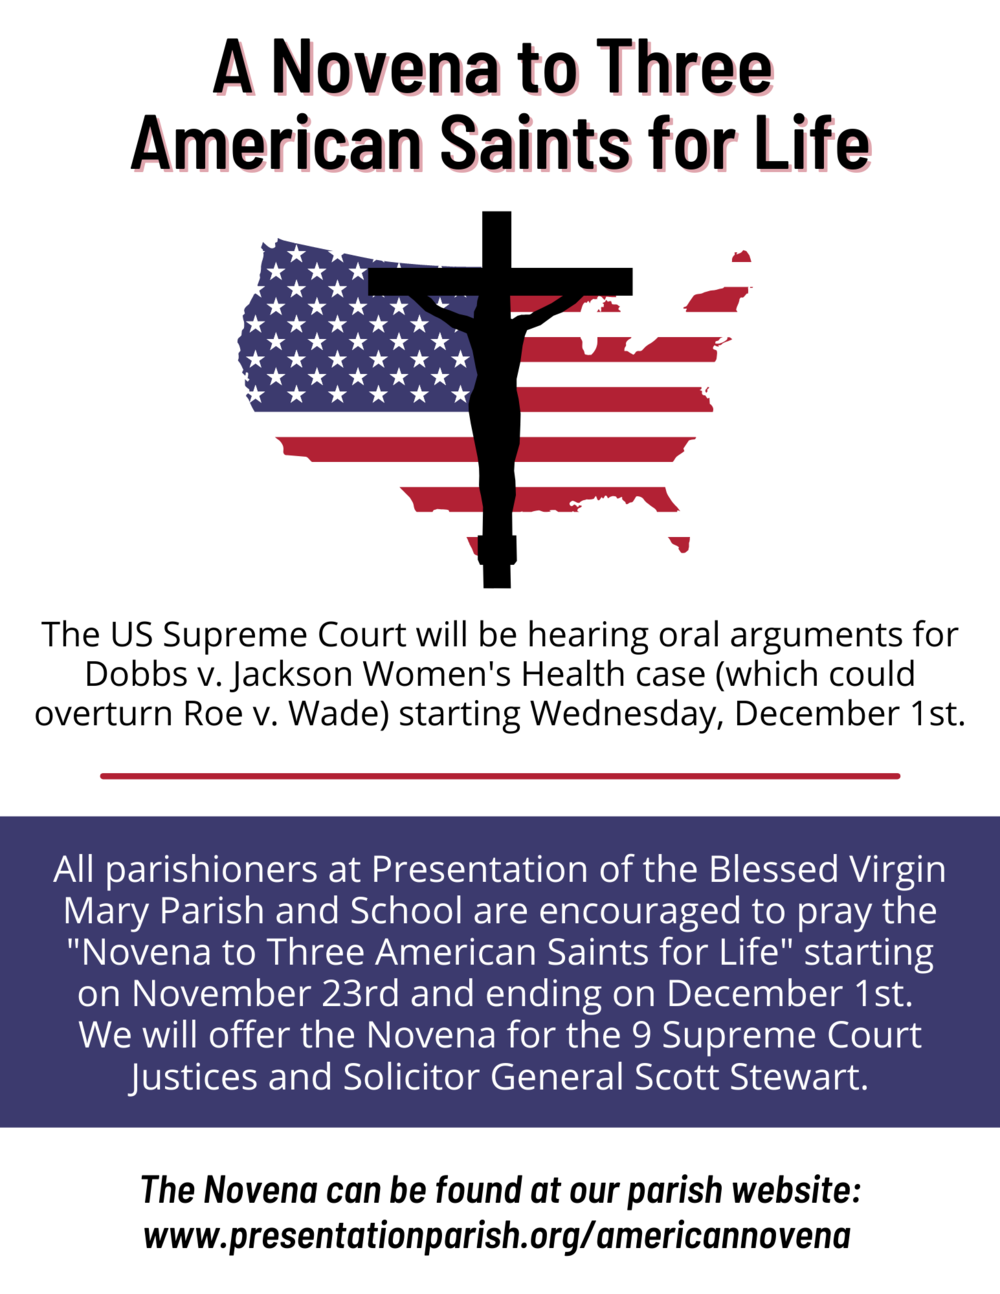 A Novena To Three American Saints For Life